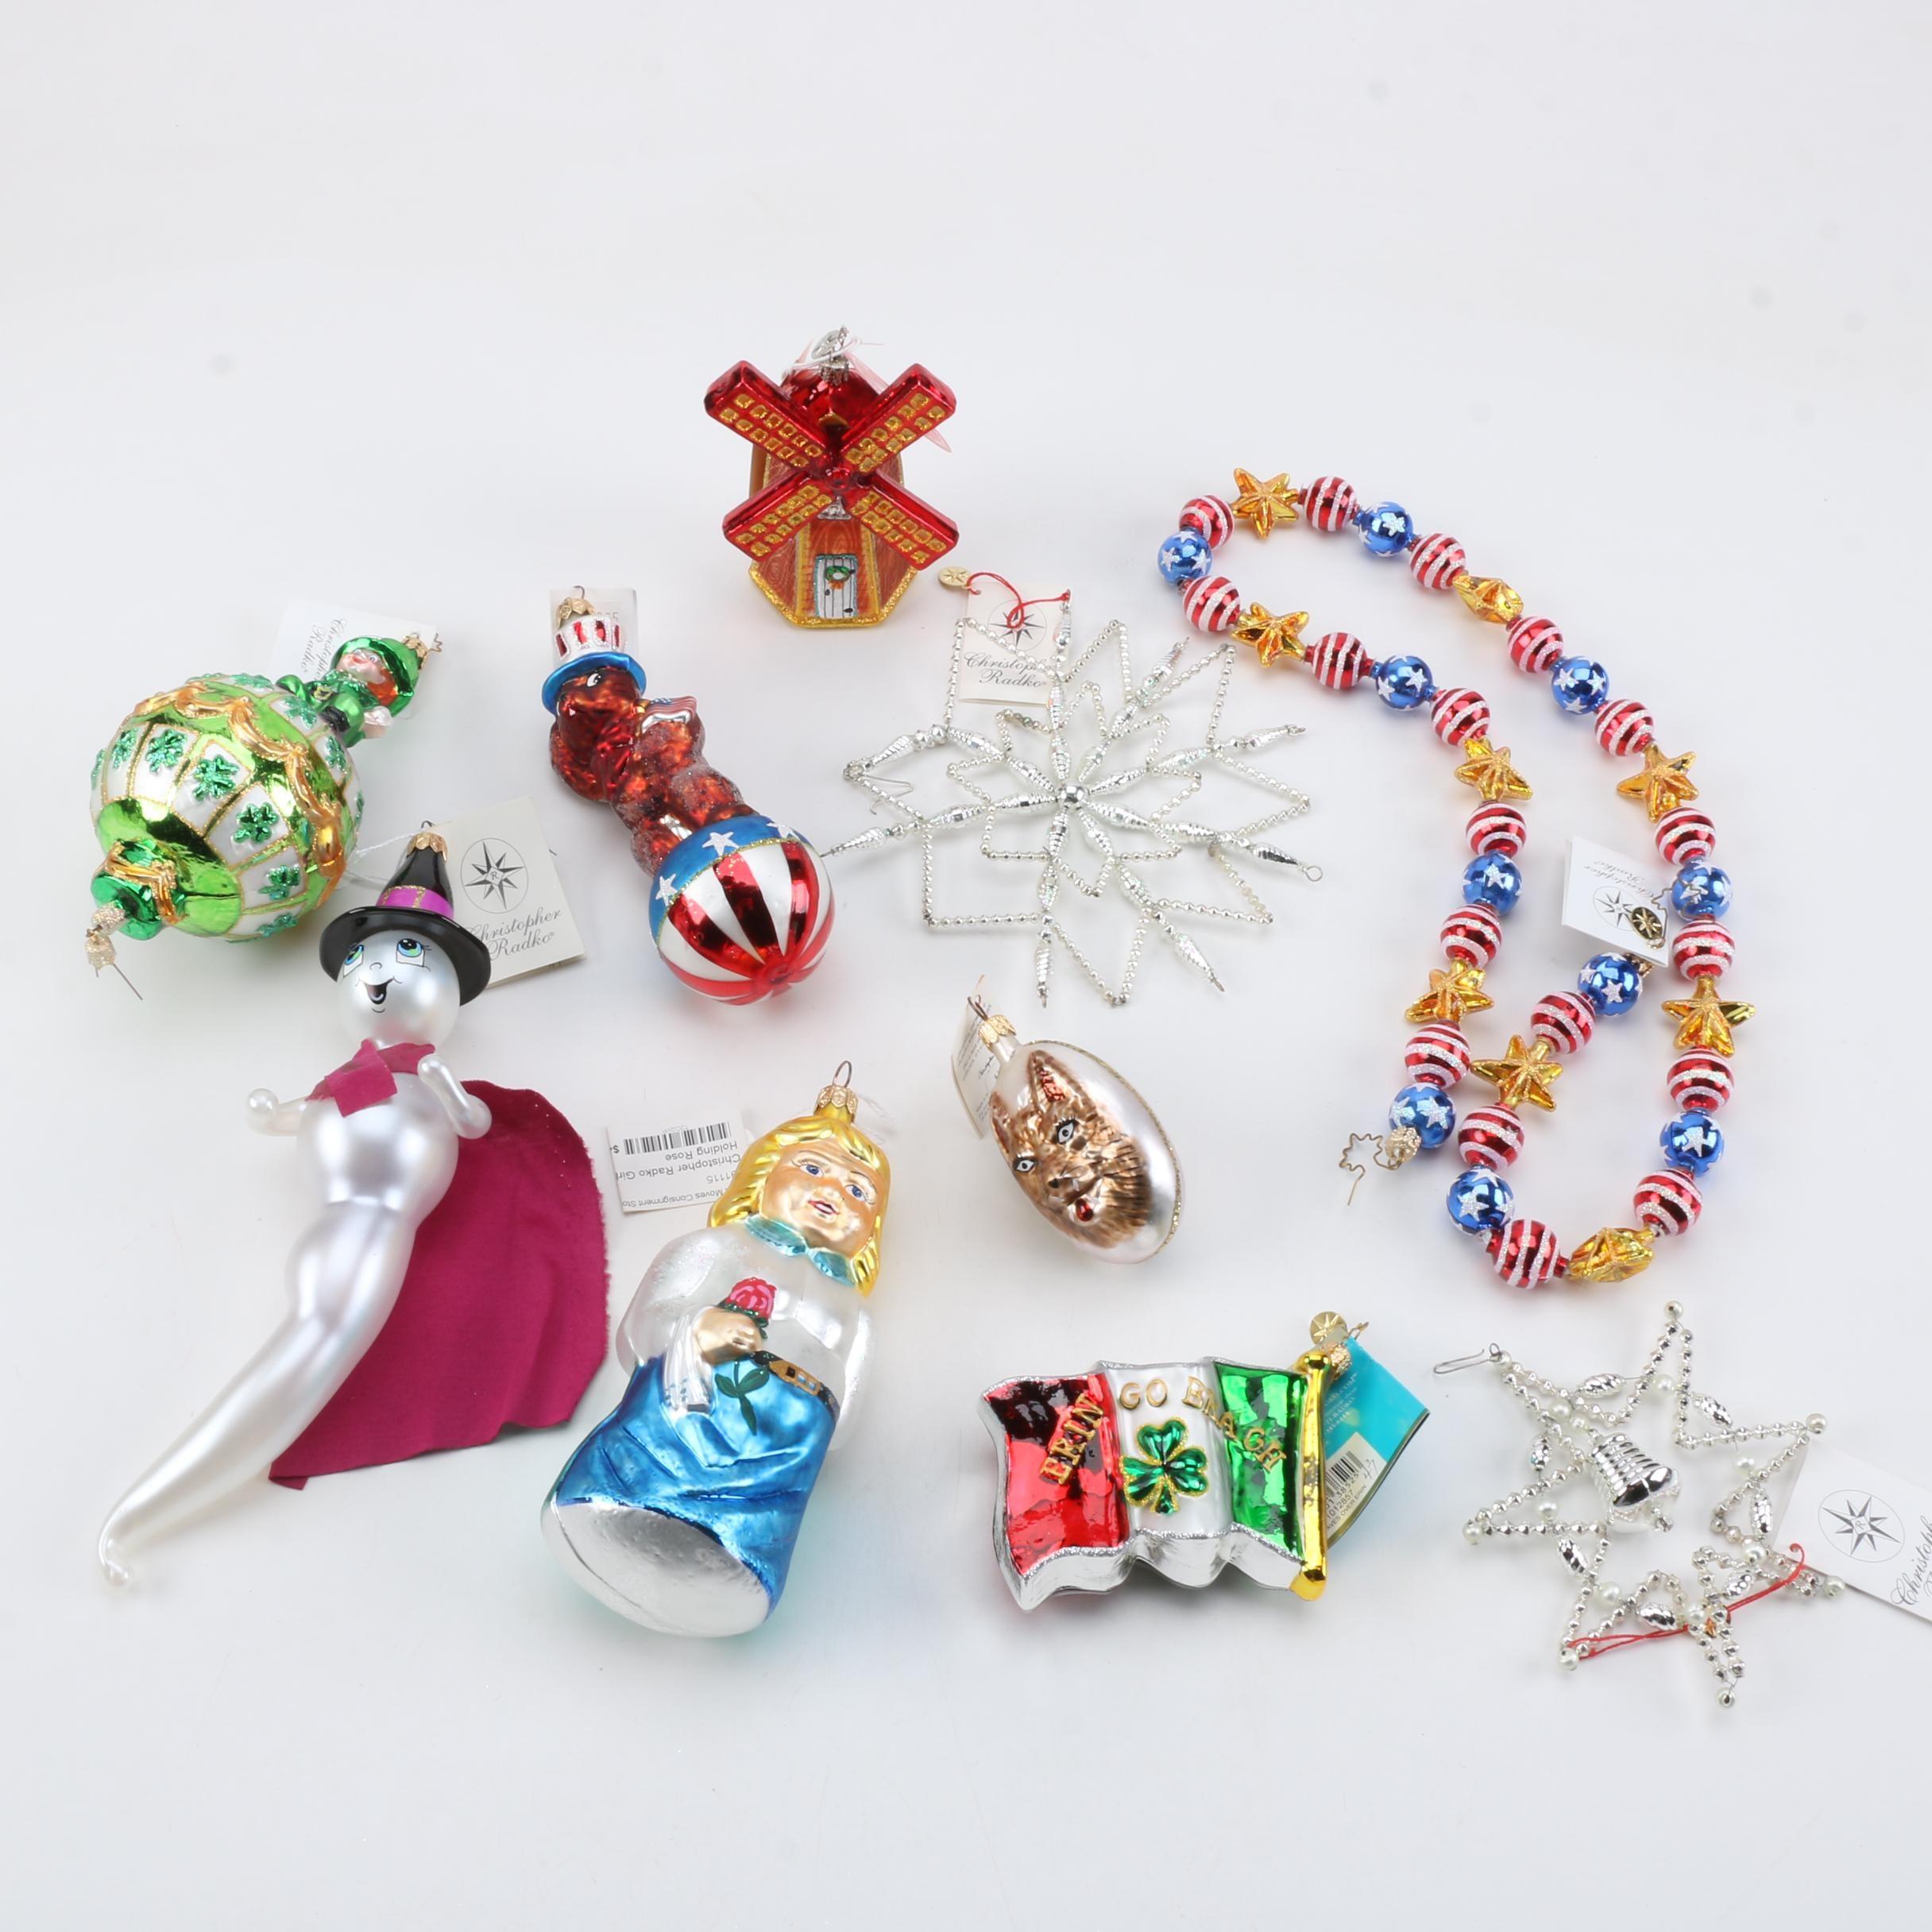 Christopher Radko Holiday Ornaments